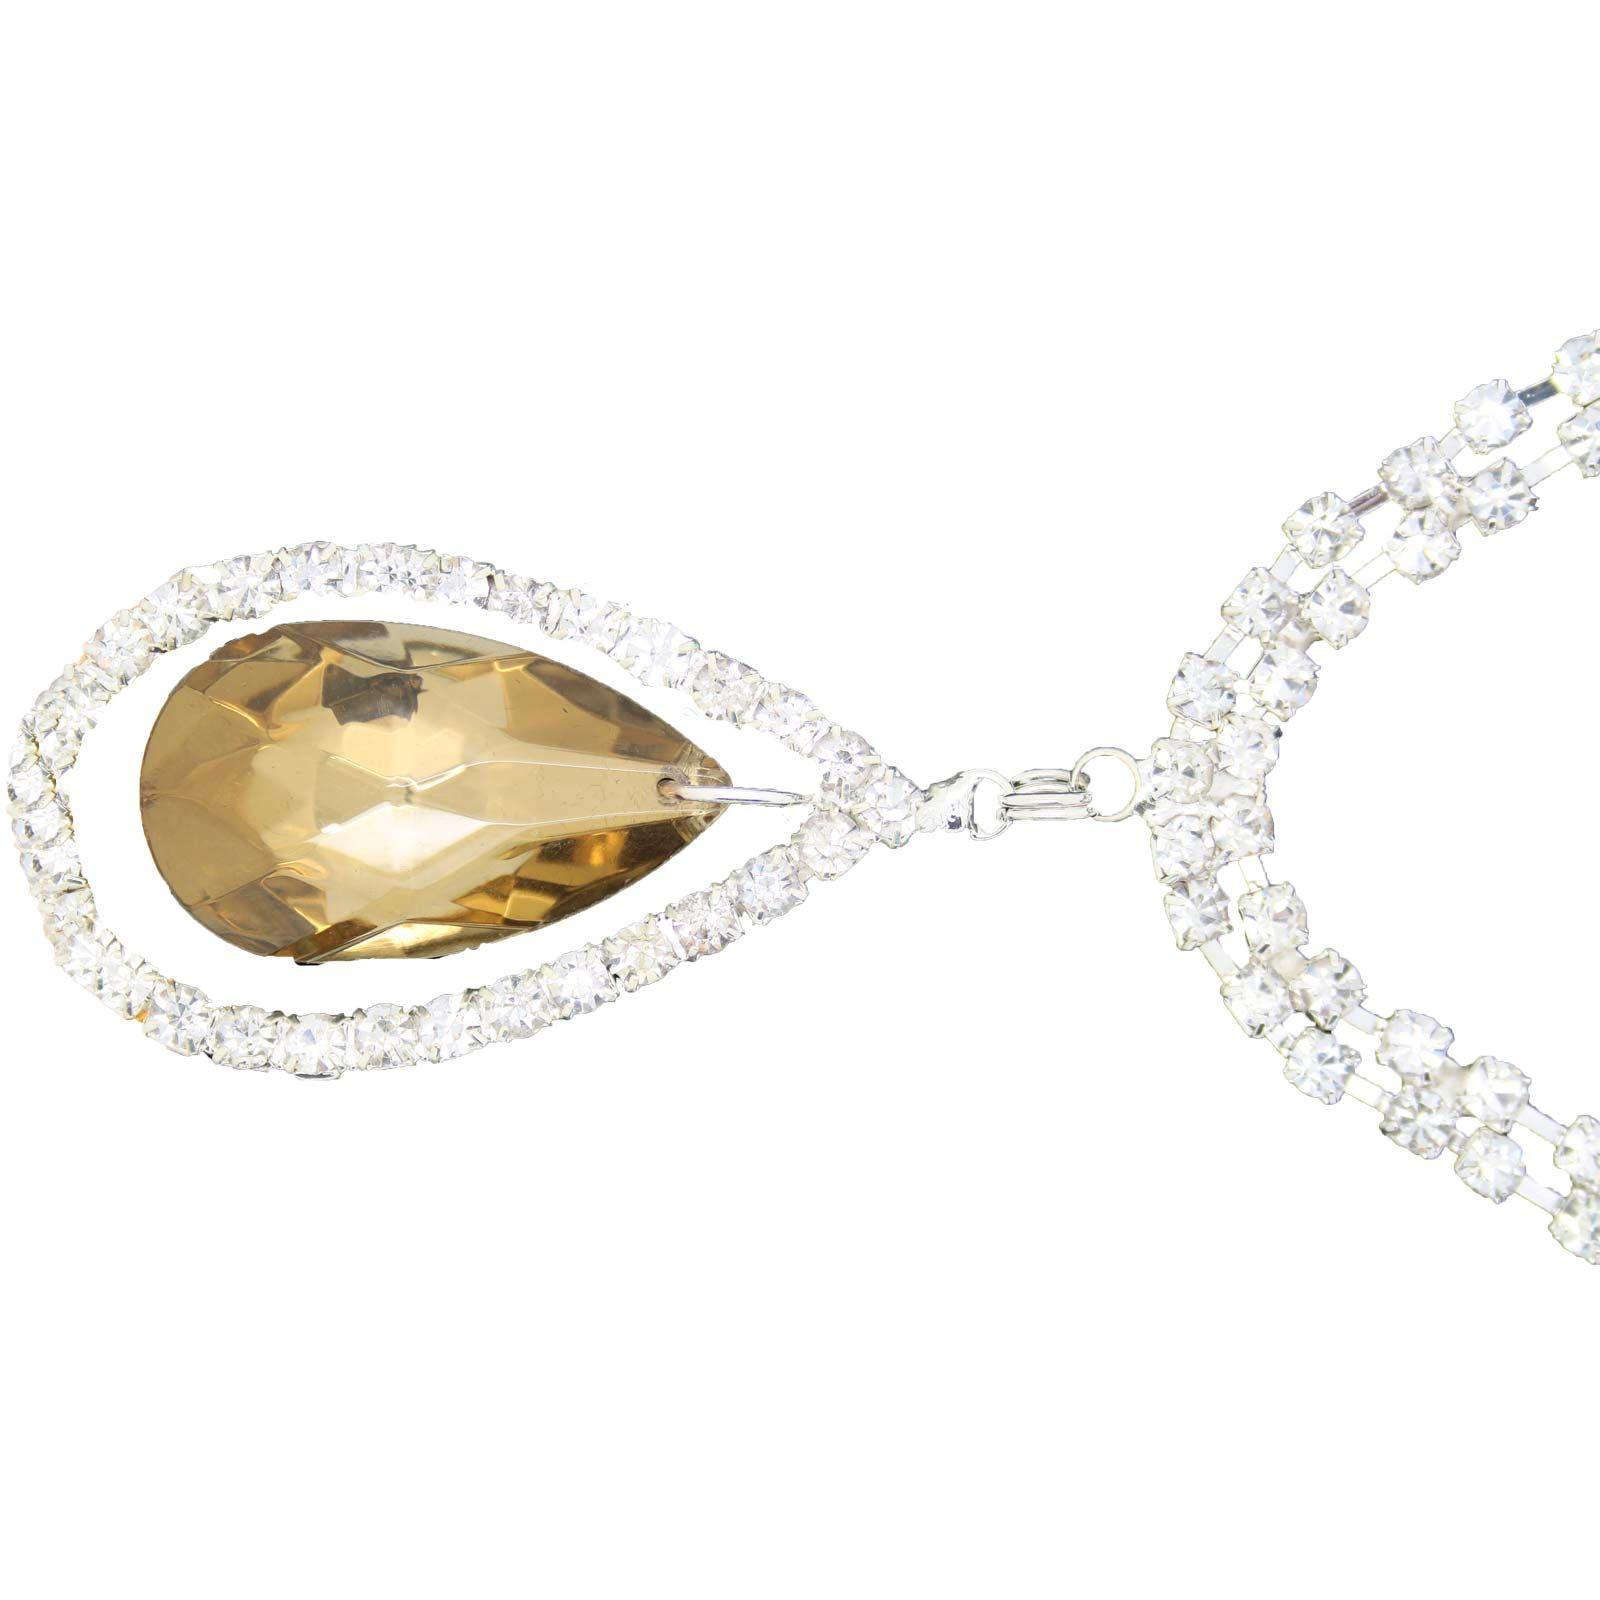 True-Face-Ladies-Women-039-s-Elegant-Earrings-Necklace-Set-Metal-Alloy-Jewellery thumbnail 42